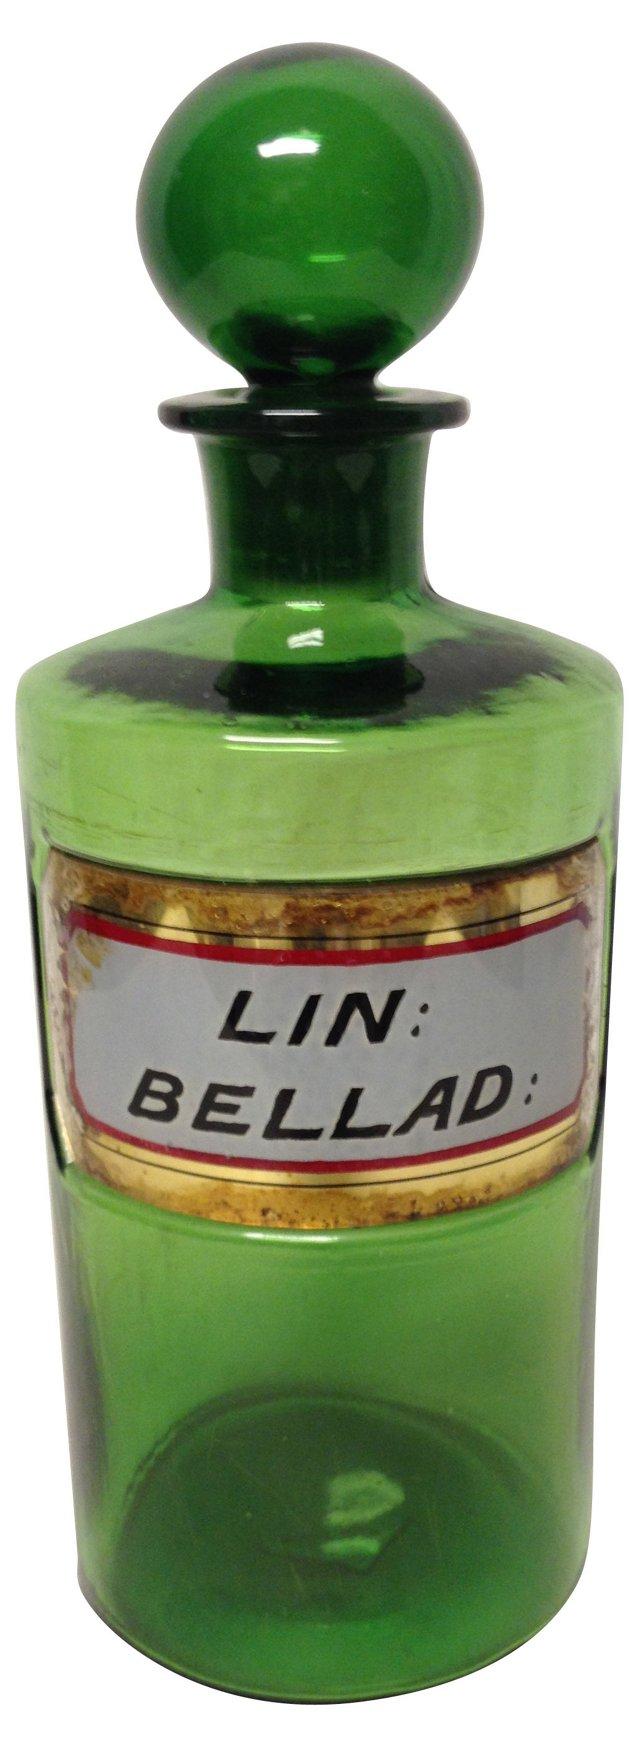 Antique Green Apothecary Bottle